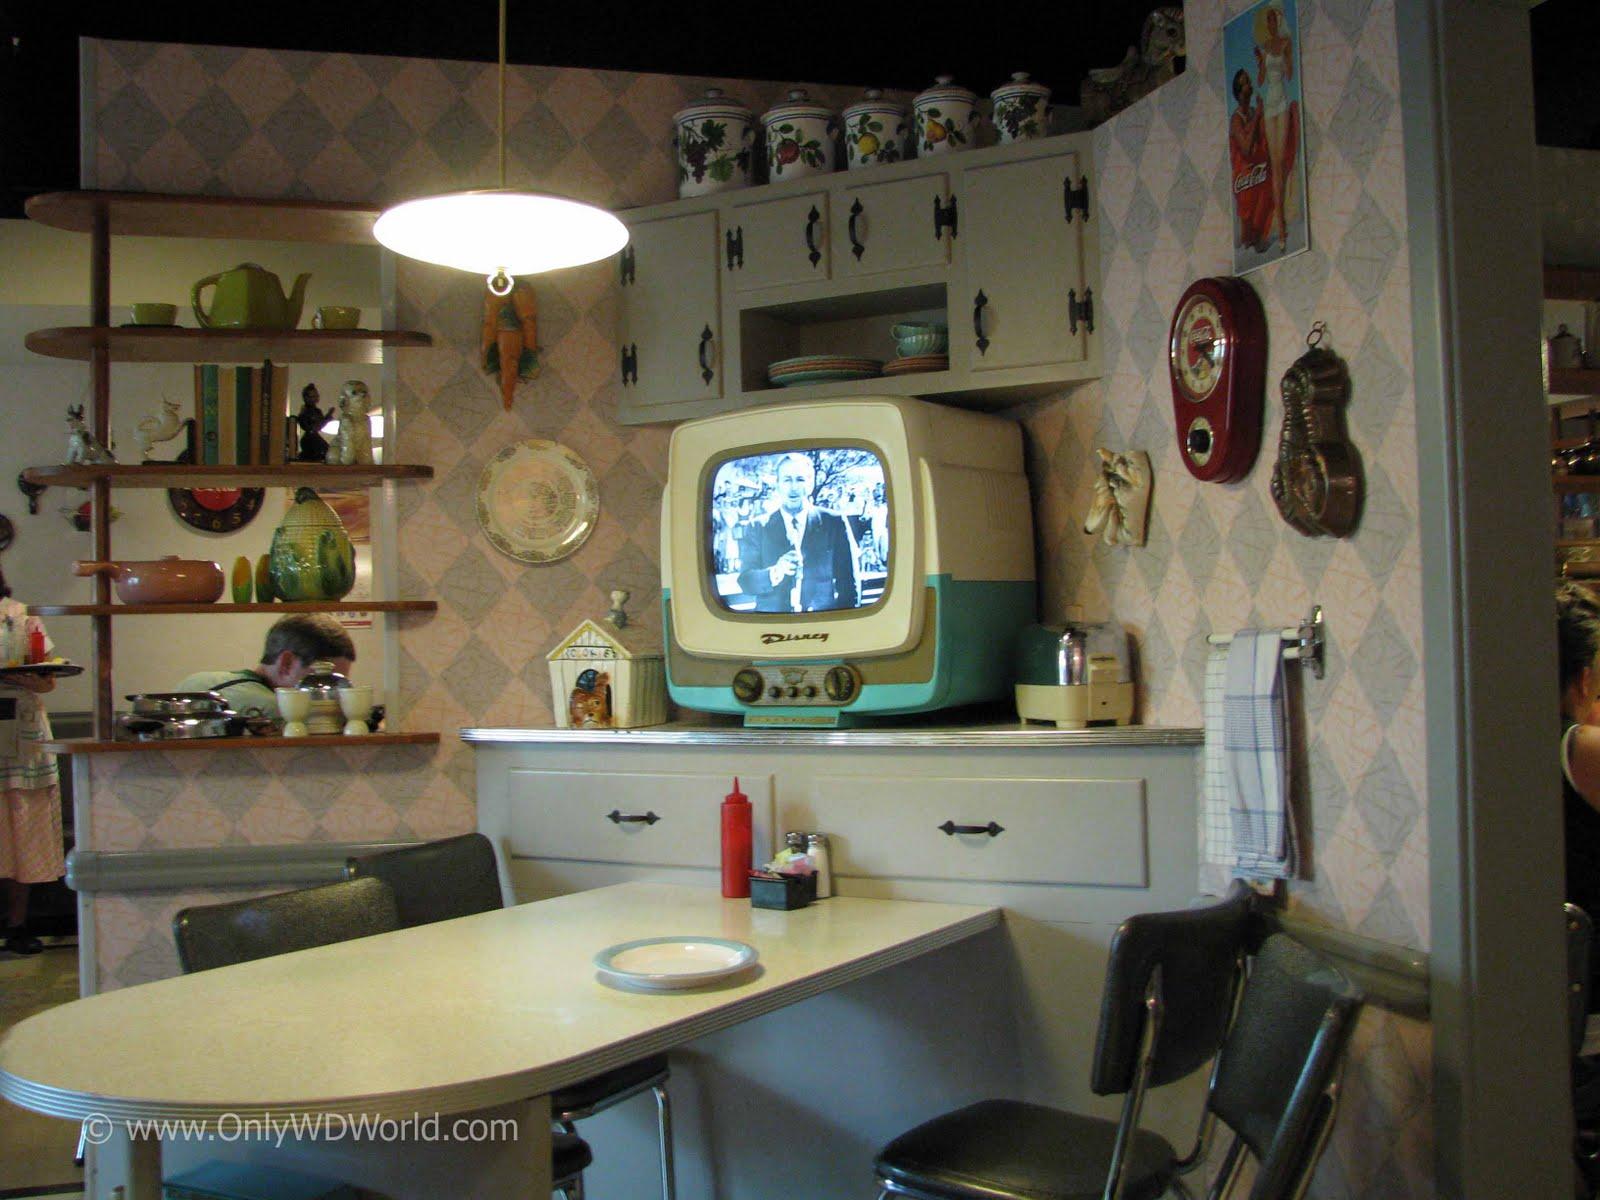 Only wdworld restaurant guide disney 39 s hollywood studios for Cuisine 50 s